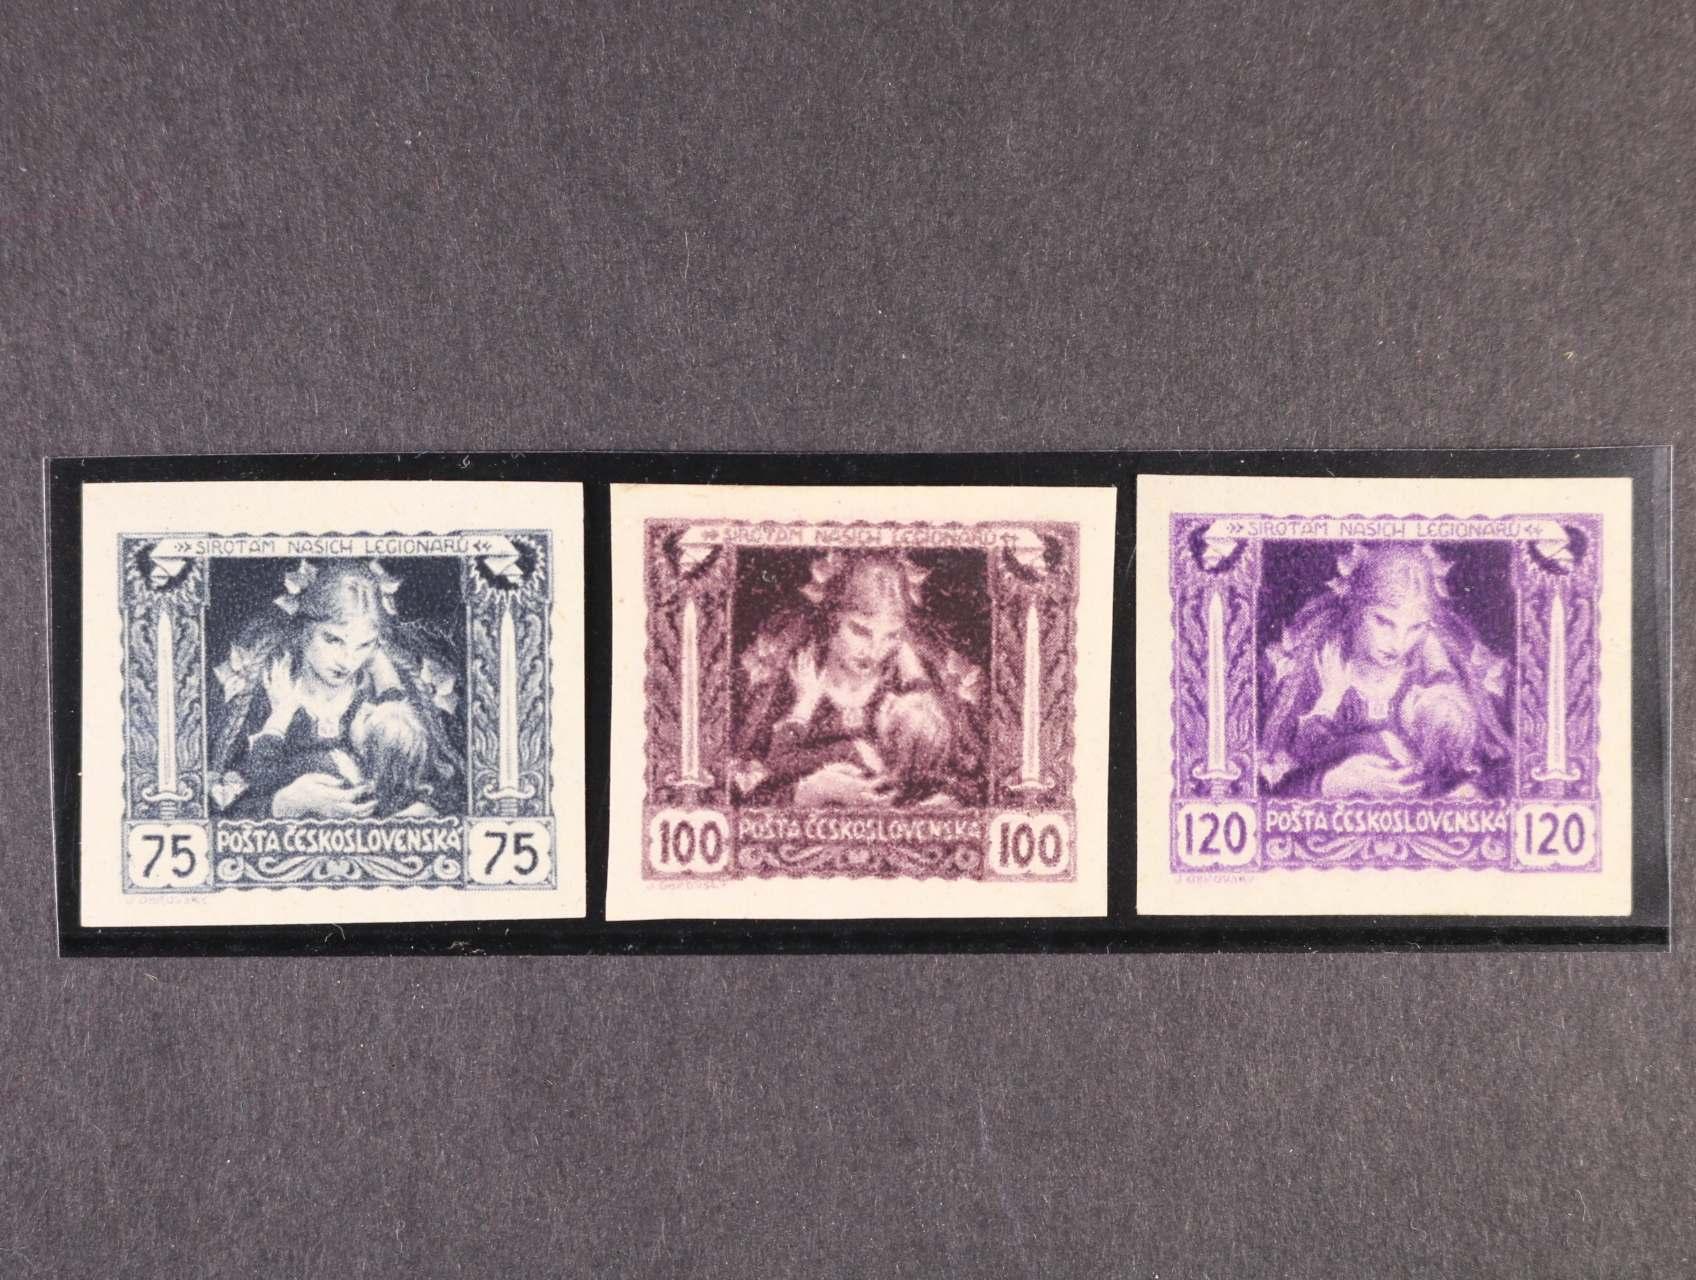 zn. č. 30 N - 32 N, zk. Gilbert, Stupka, kat. cena 1500 Kč